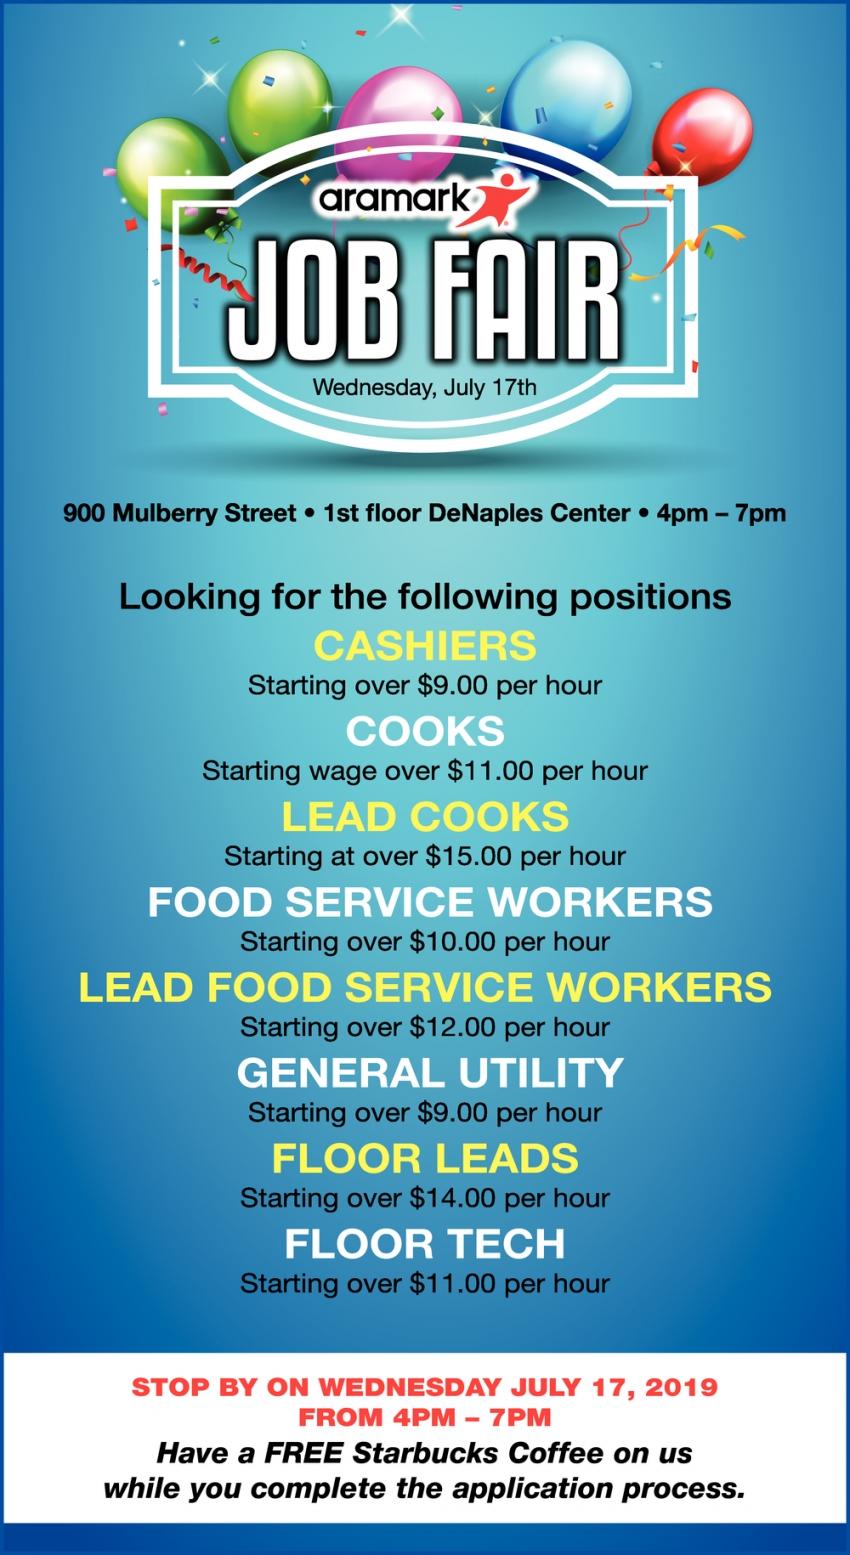 Cashier, Cook, Lead Cook, Food Service Worker, Lead Food Service, General Utility, Floor Lead